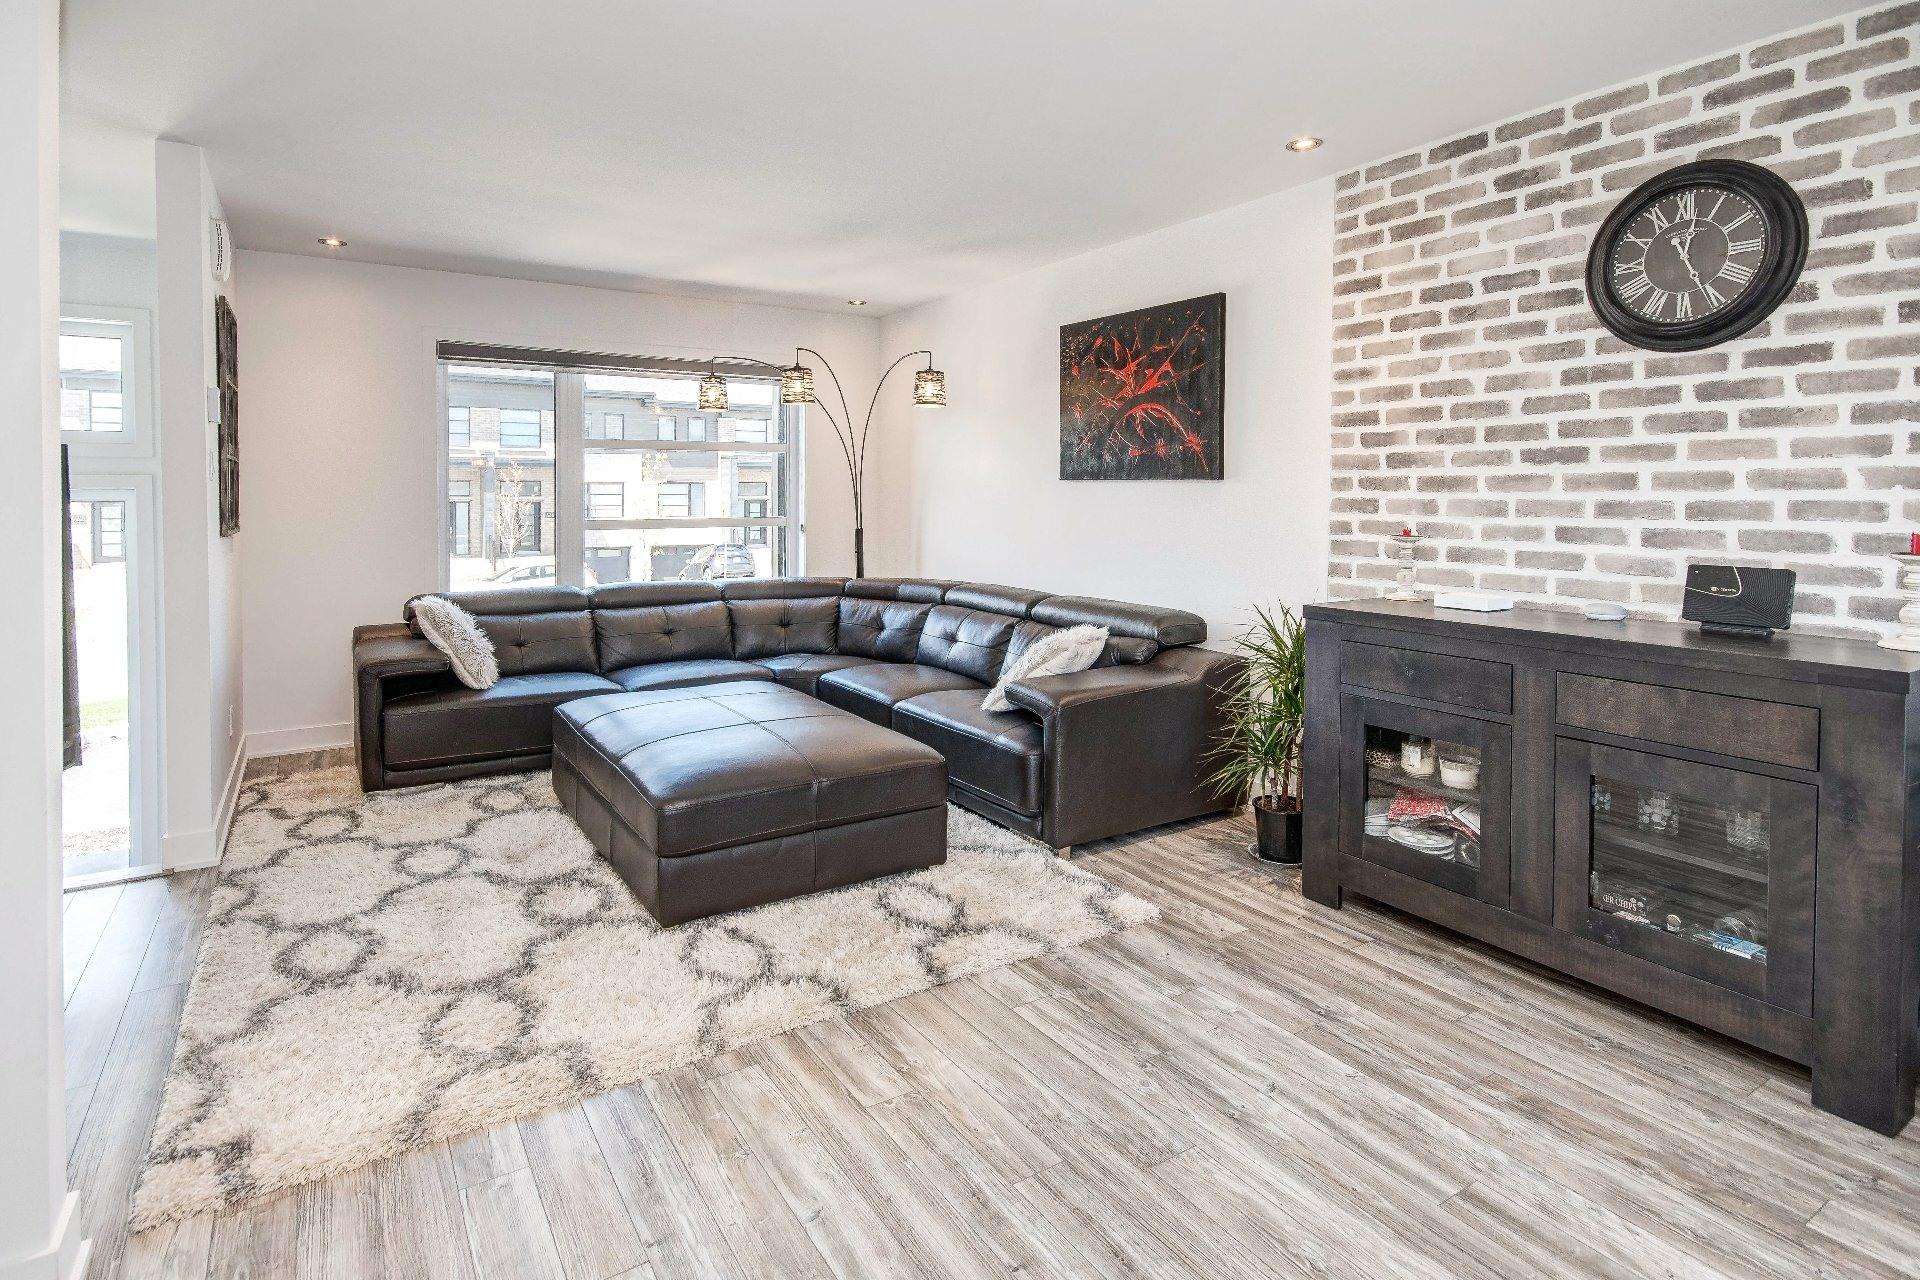 image 4 - MX - Casa sola - MX En venta Saint-Constant - 10 habitaciones